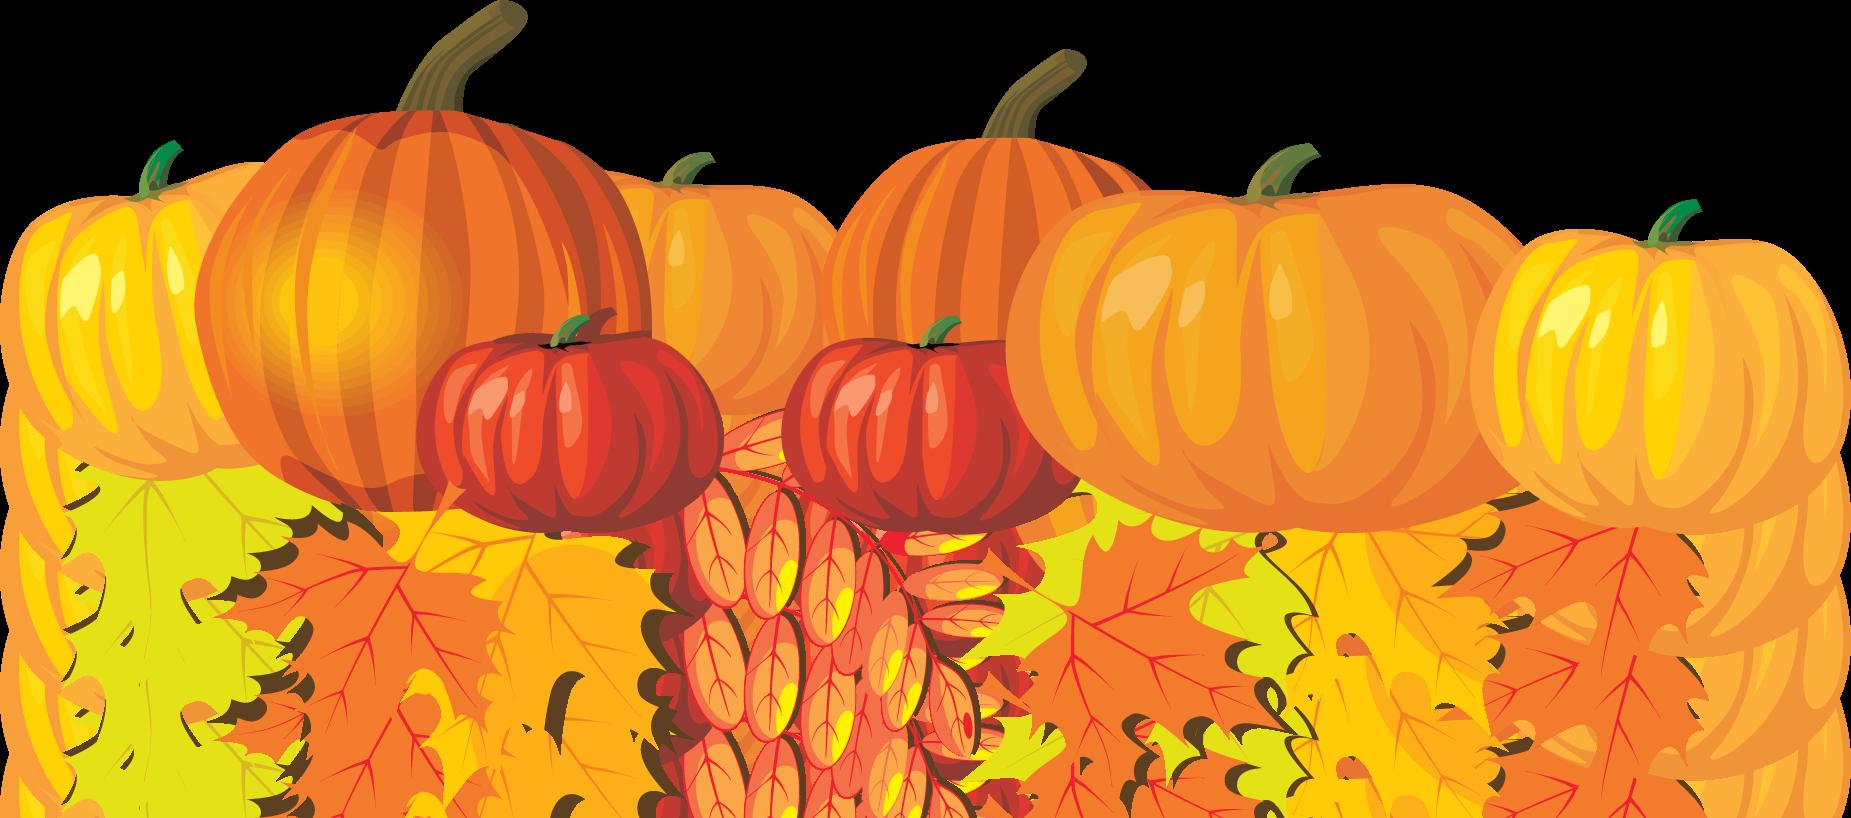 Pumpkins and Leaves Clip Art.